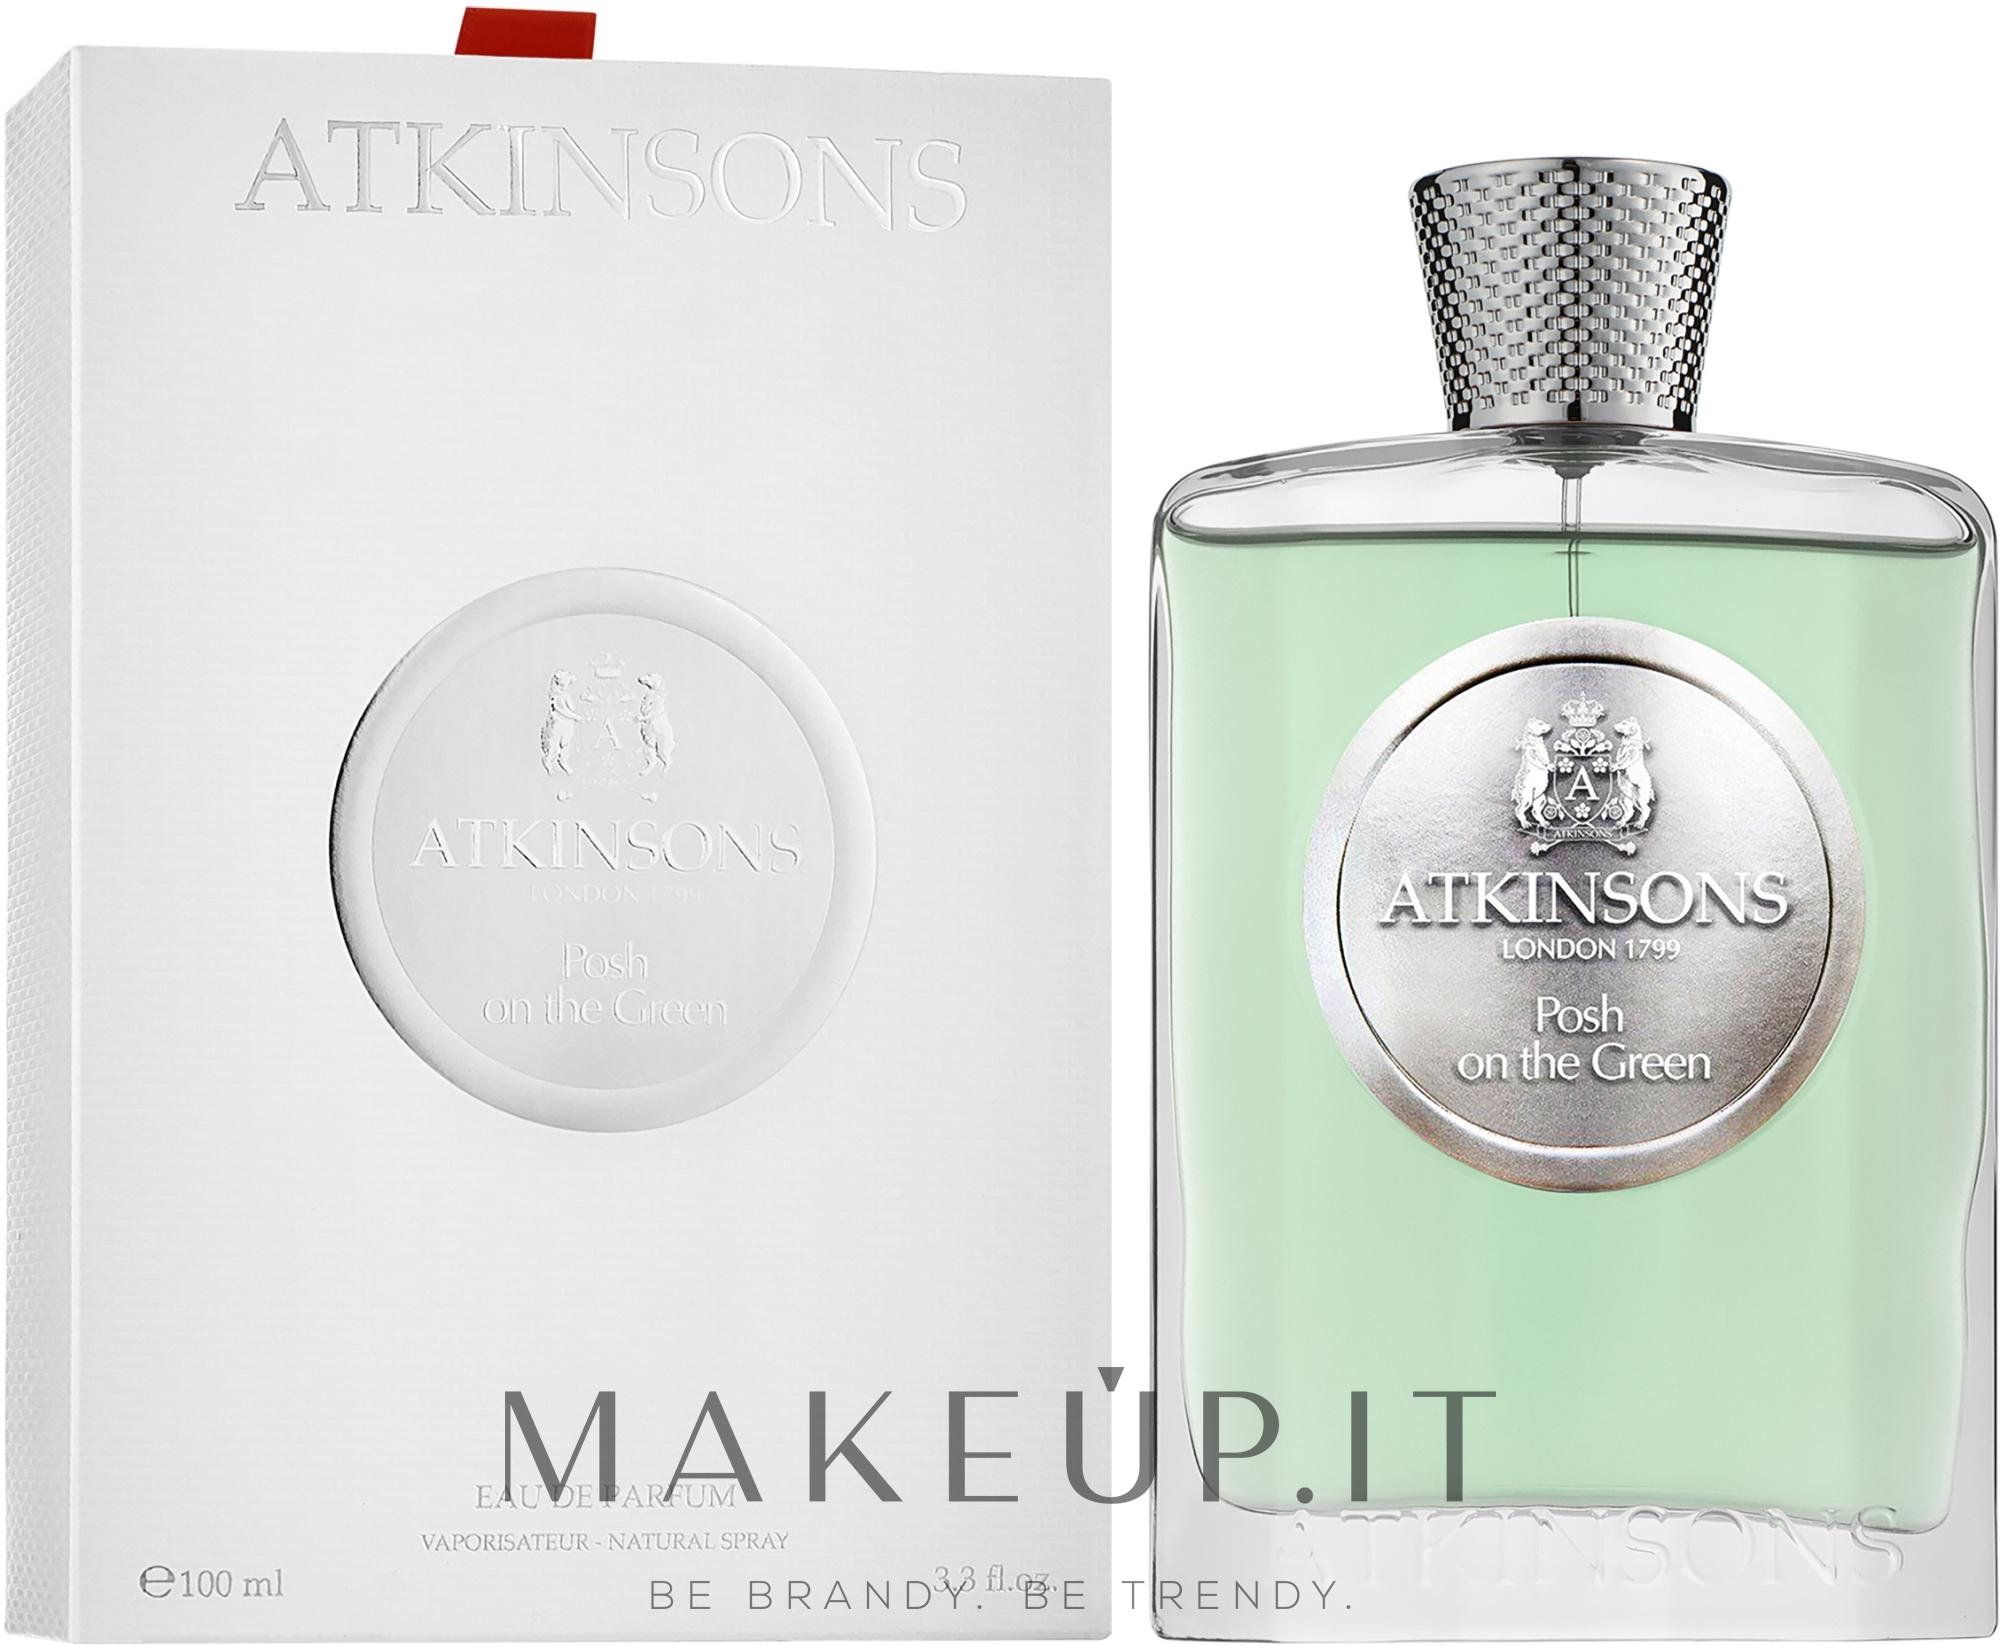 Atkinsons Posh on the Green - Eau de Parfum — foto 100 ml